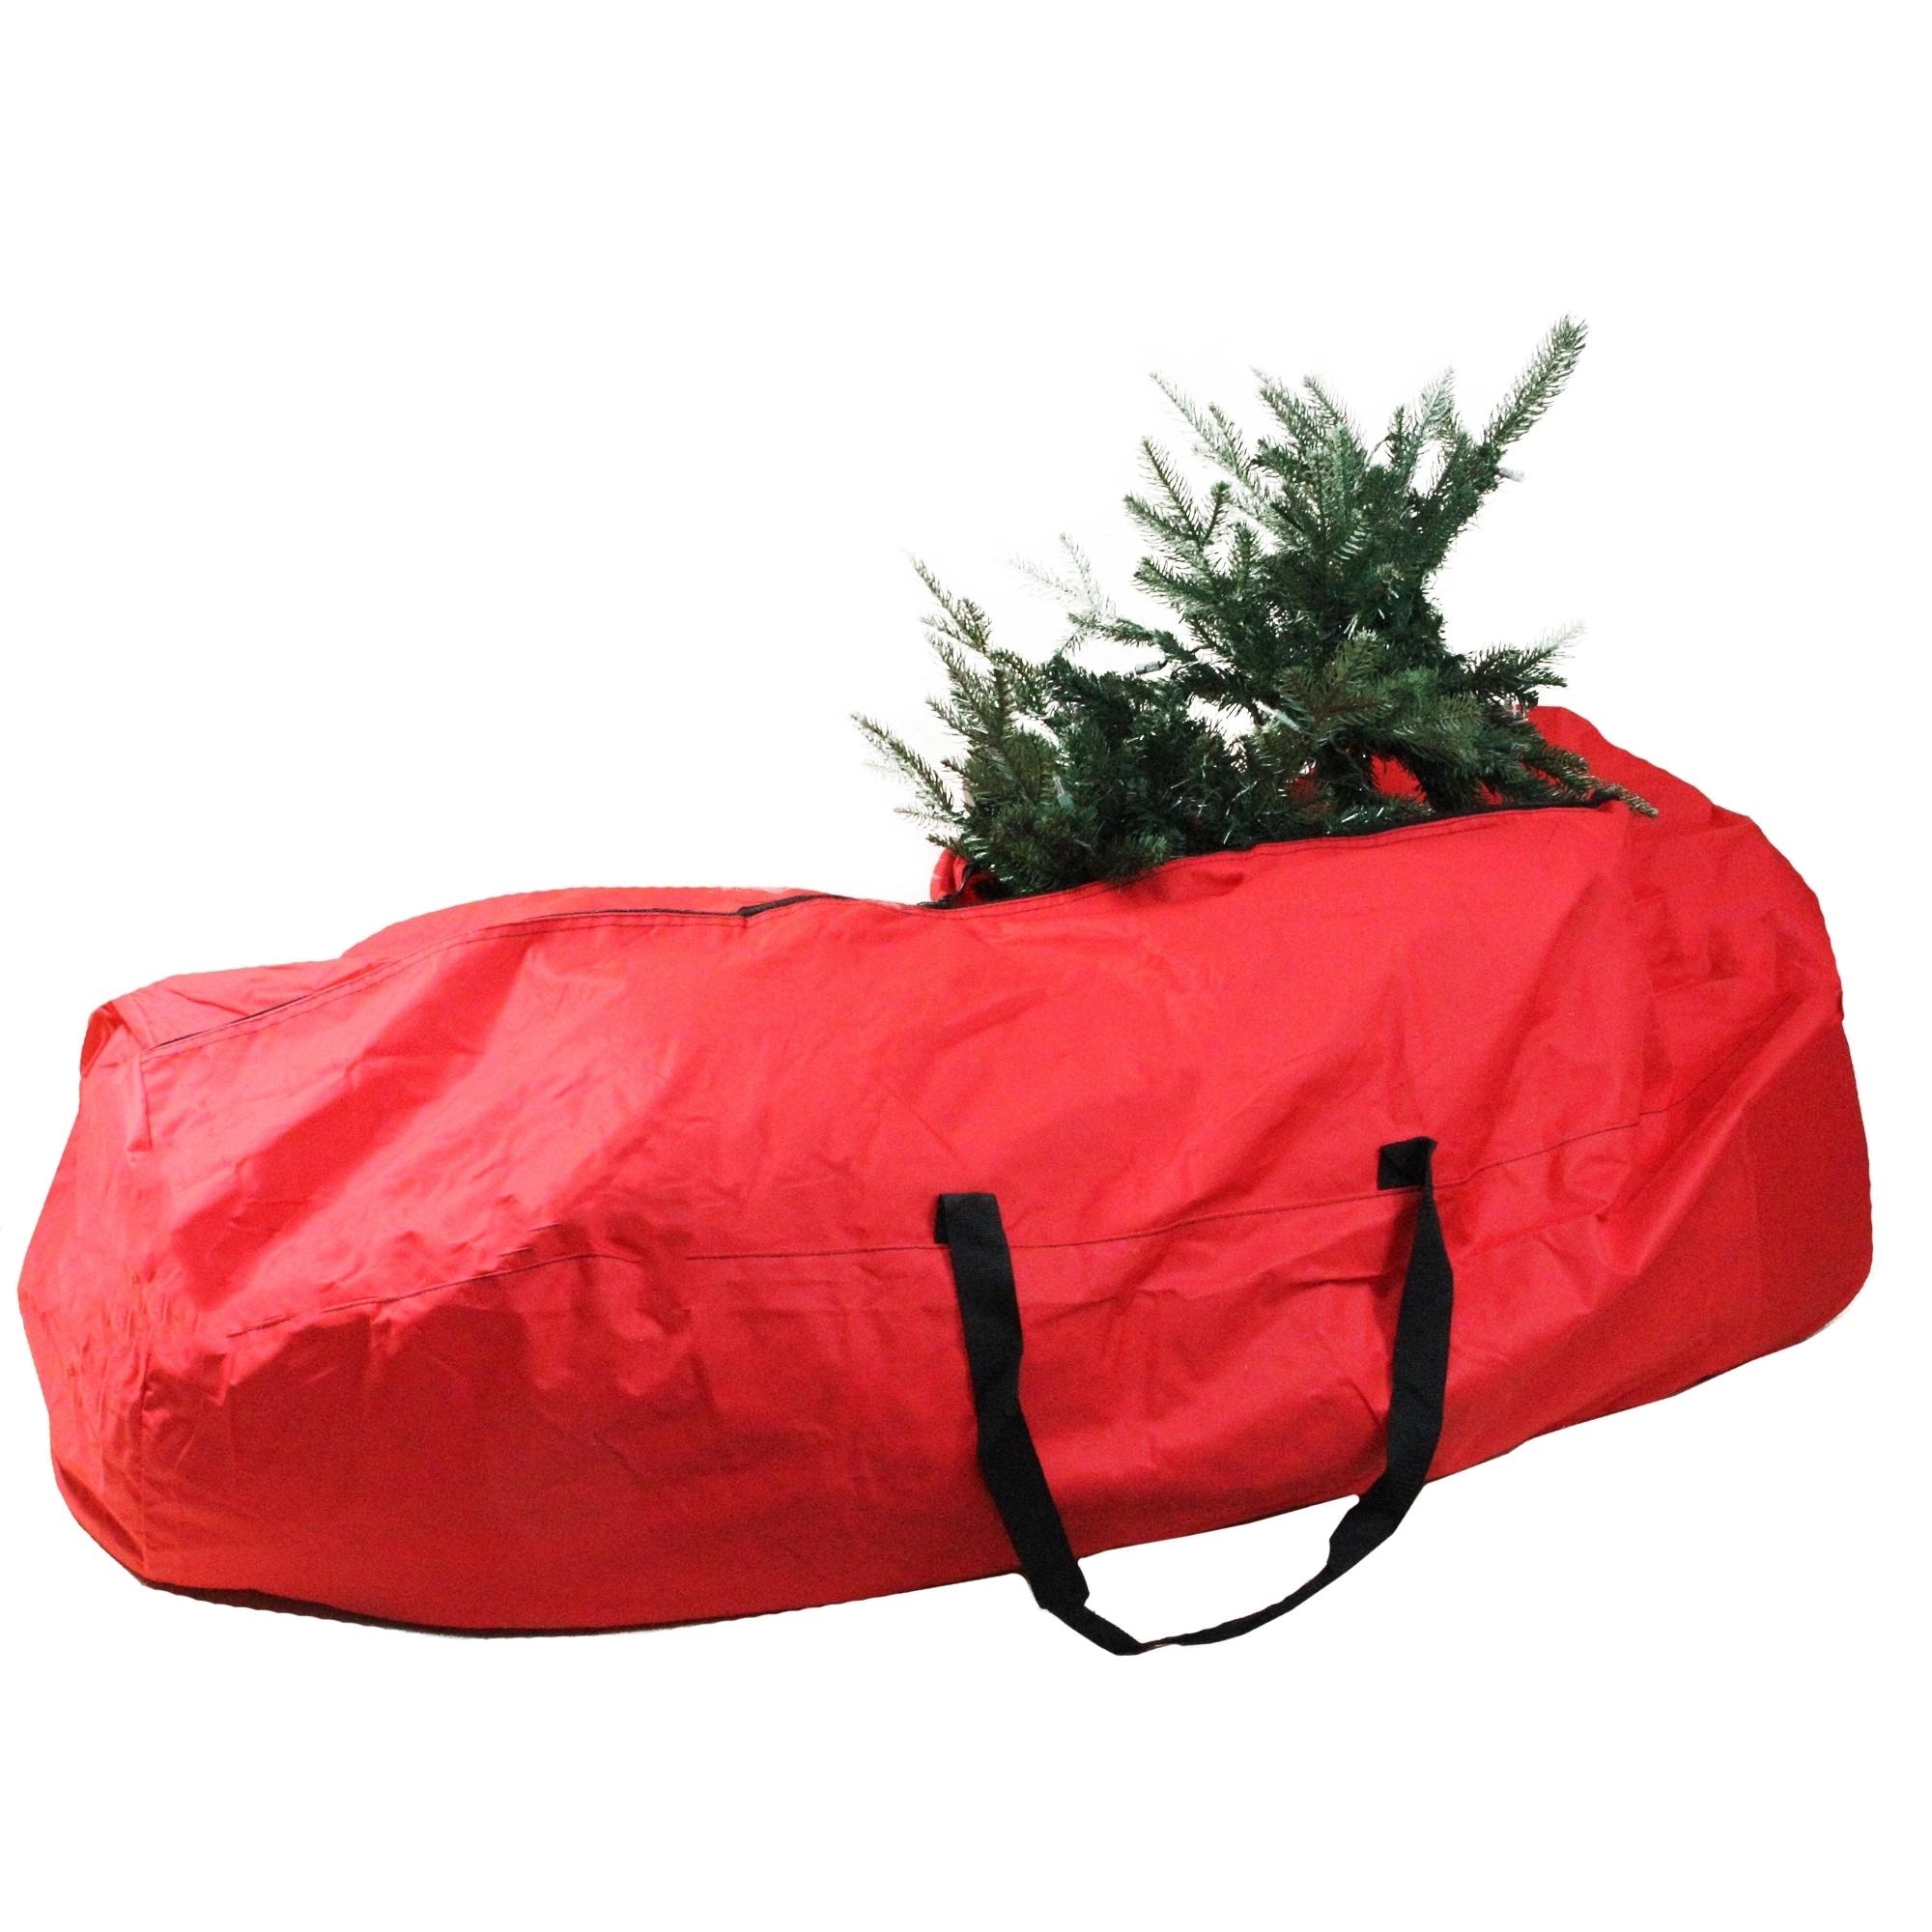 "Dyno Seasonal 56"" Heavy Duty Large Red Rolling Artificial..."